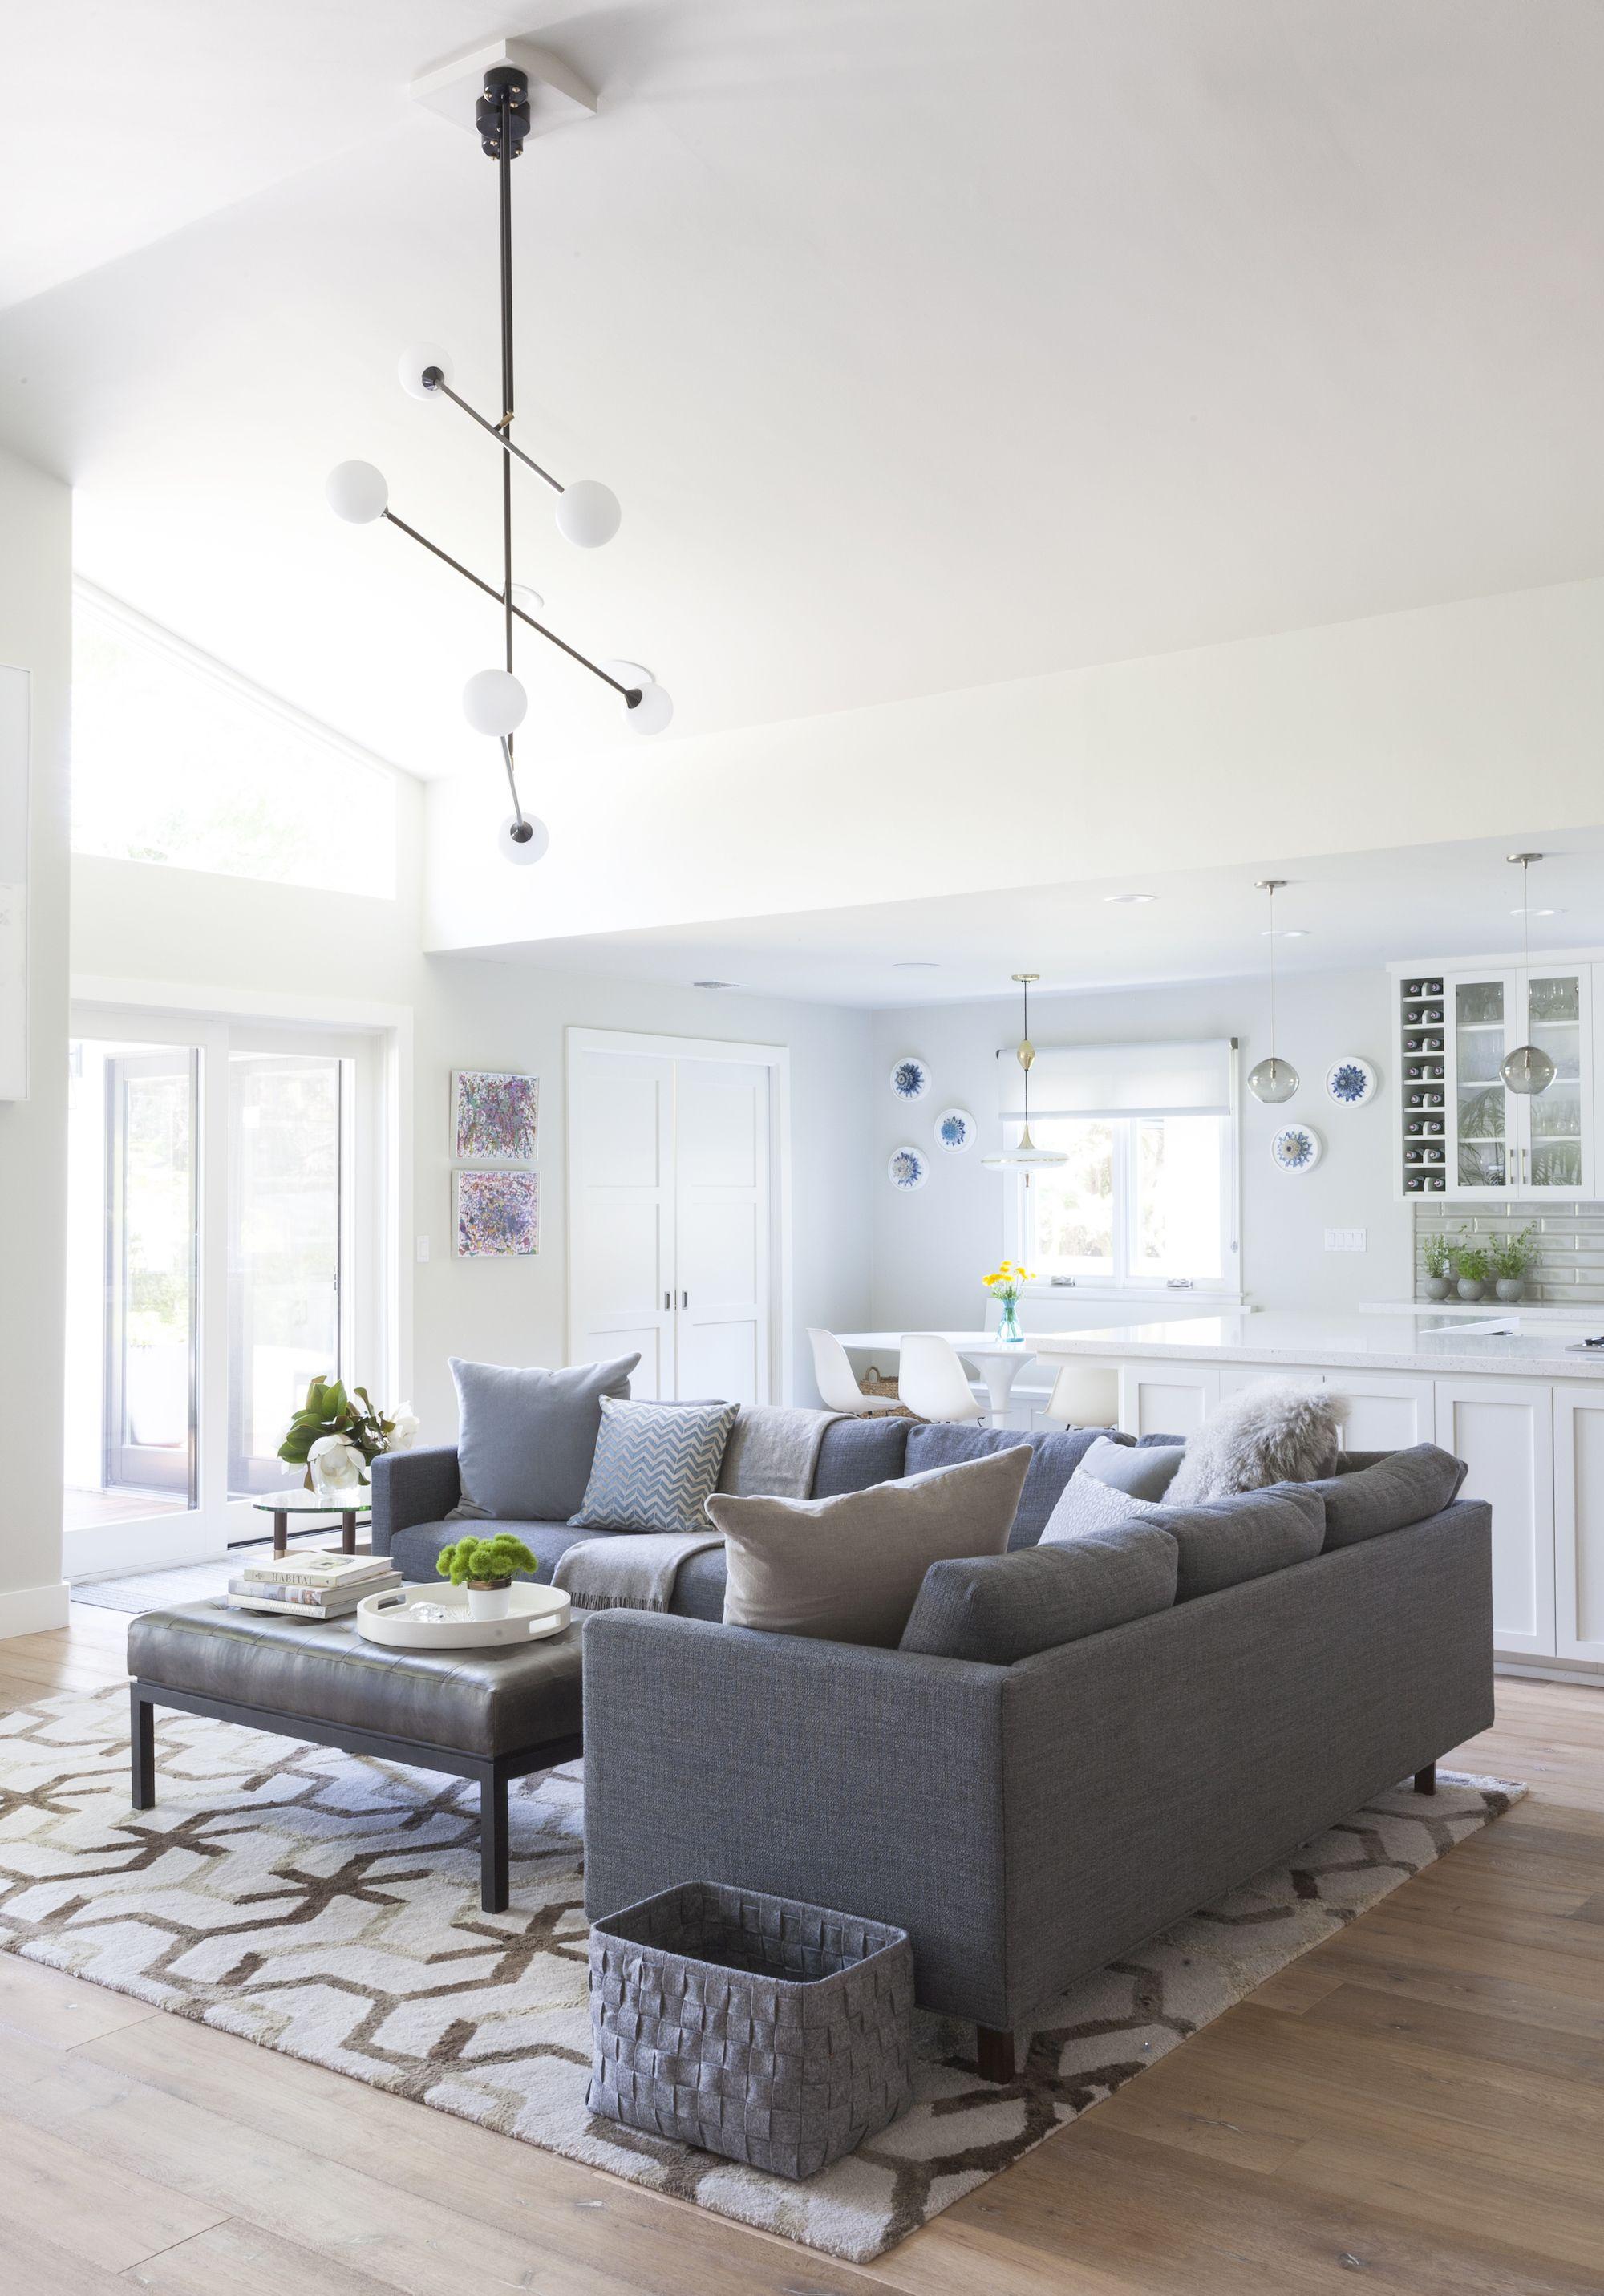 40 sectional sofas for every style of living room decor living rh elledecor com